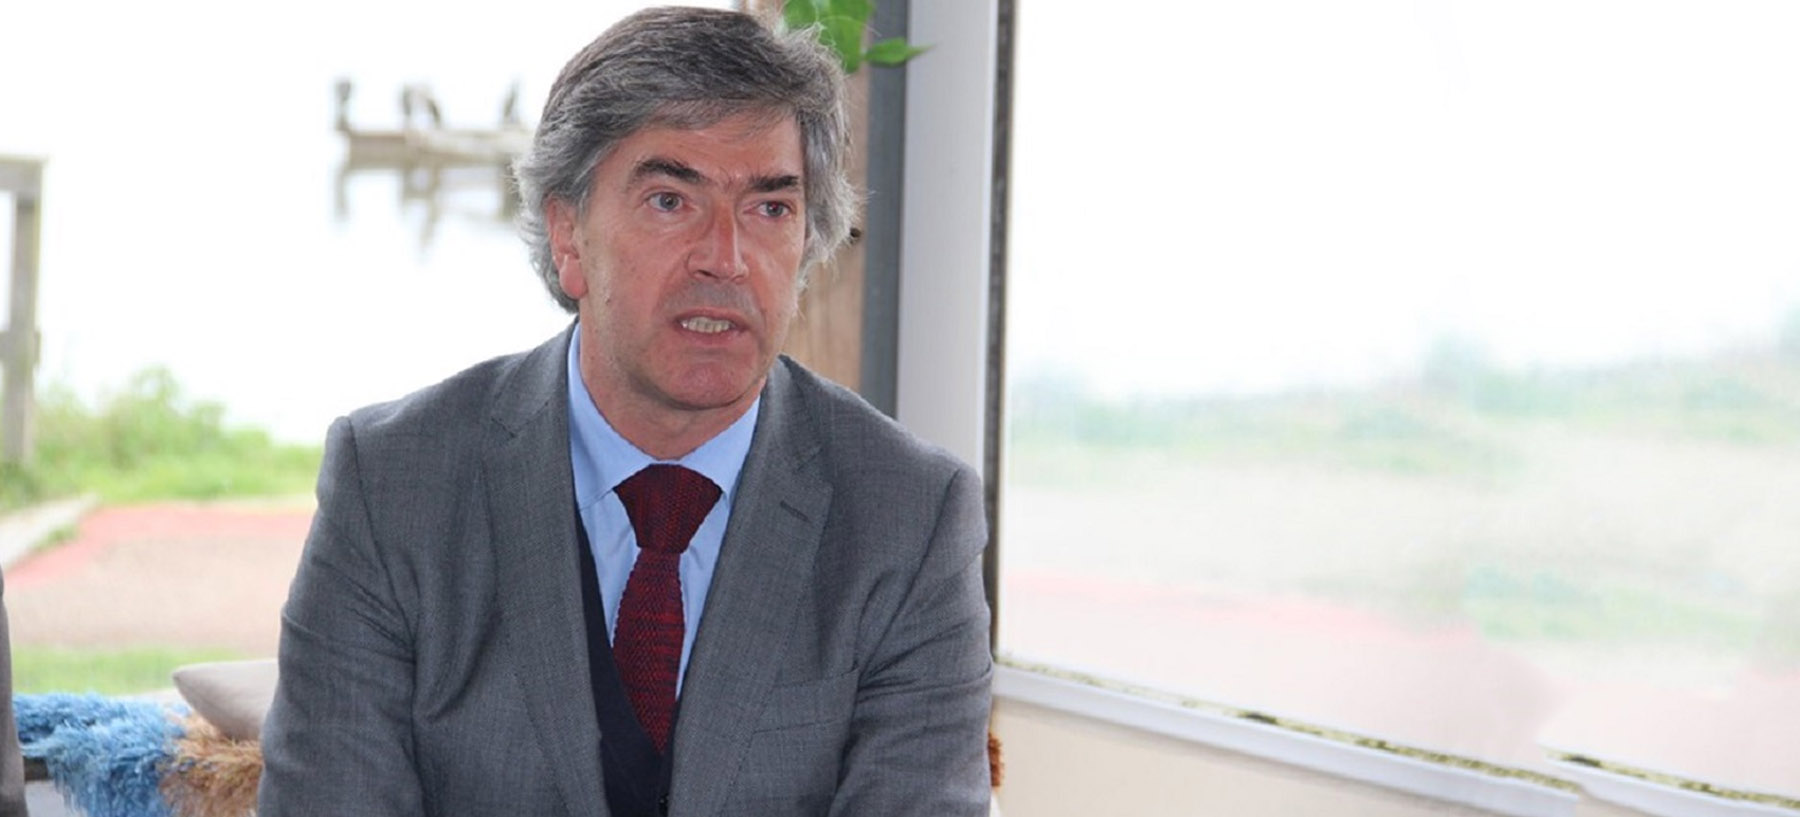 Pedro Machado, Presidente De Turismo Centro De Portugal, TCP